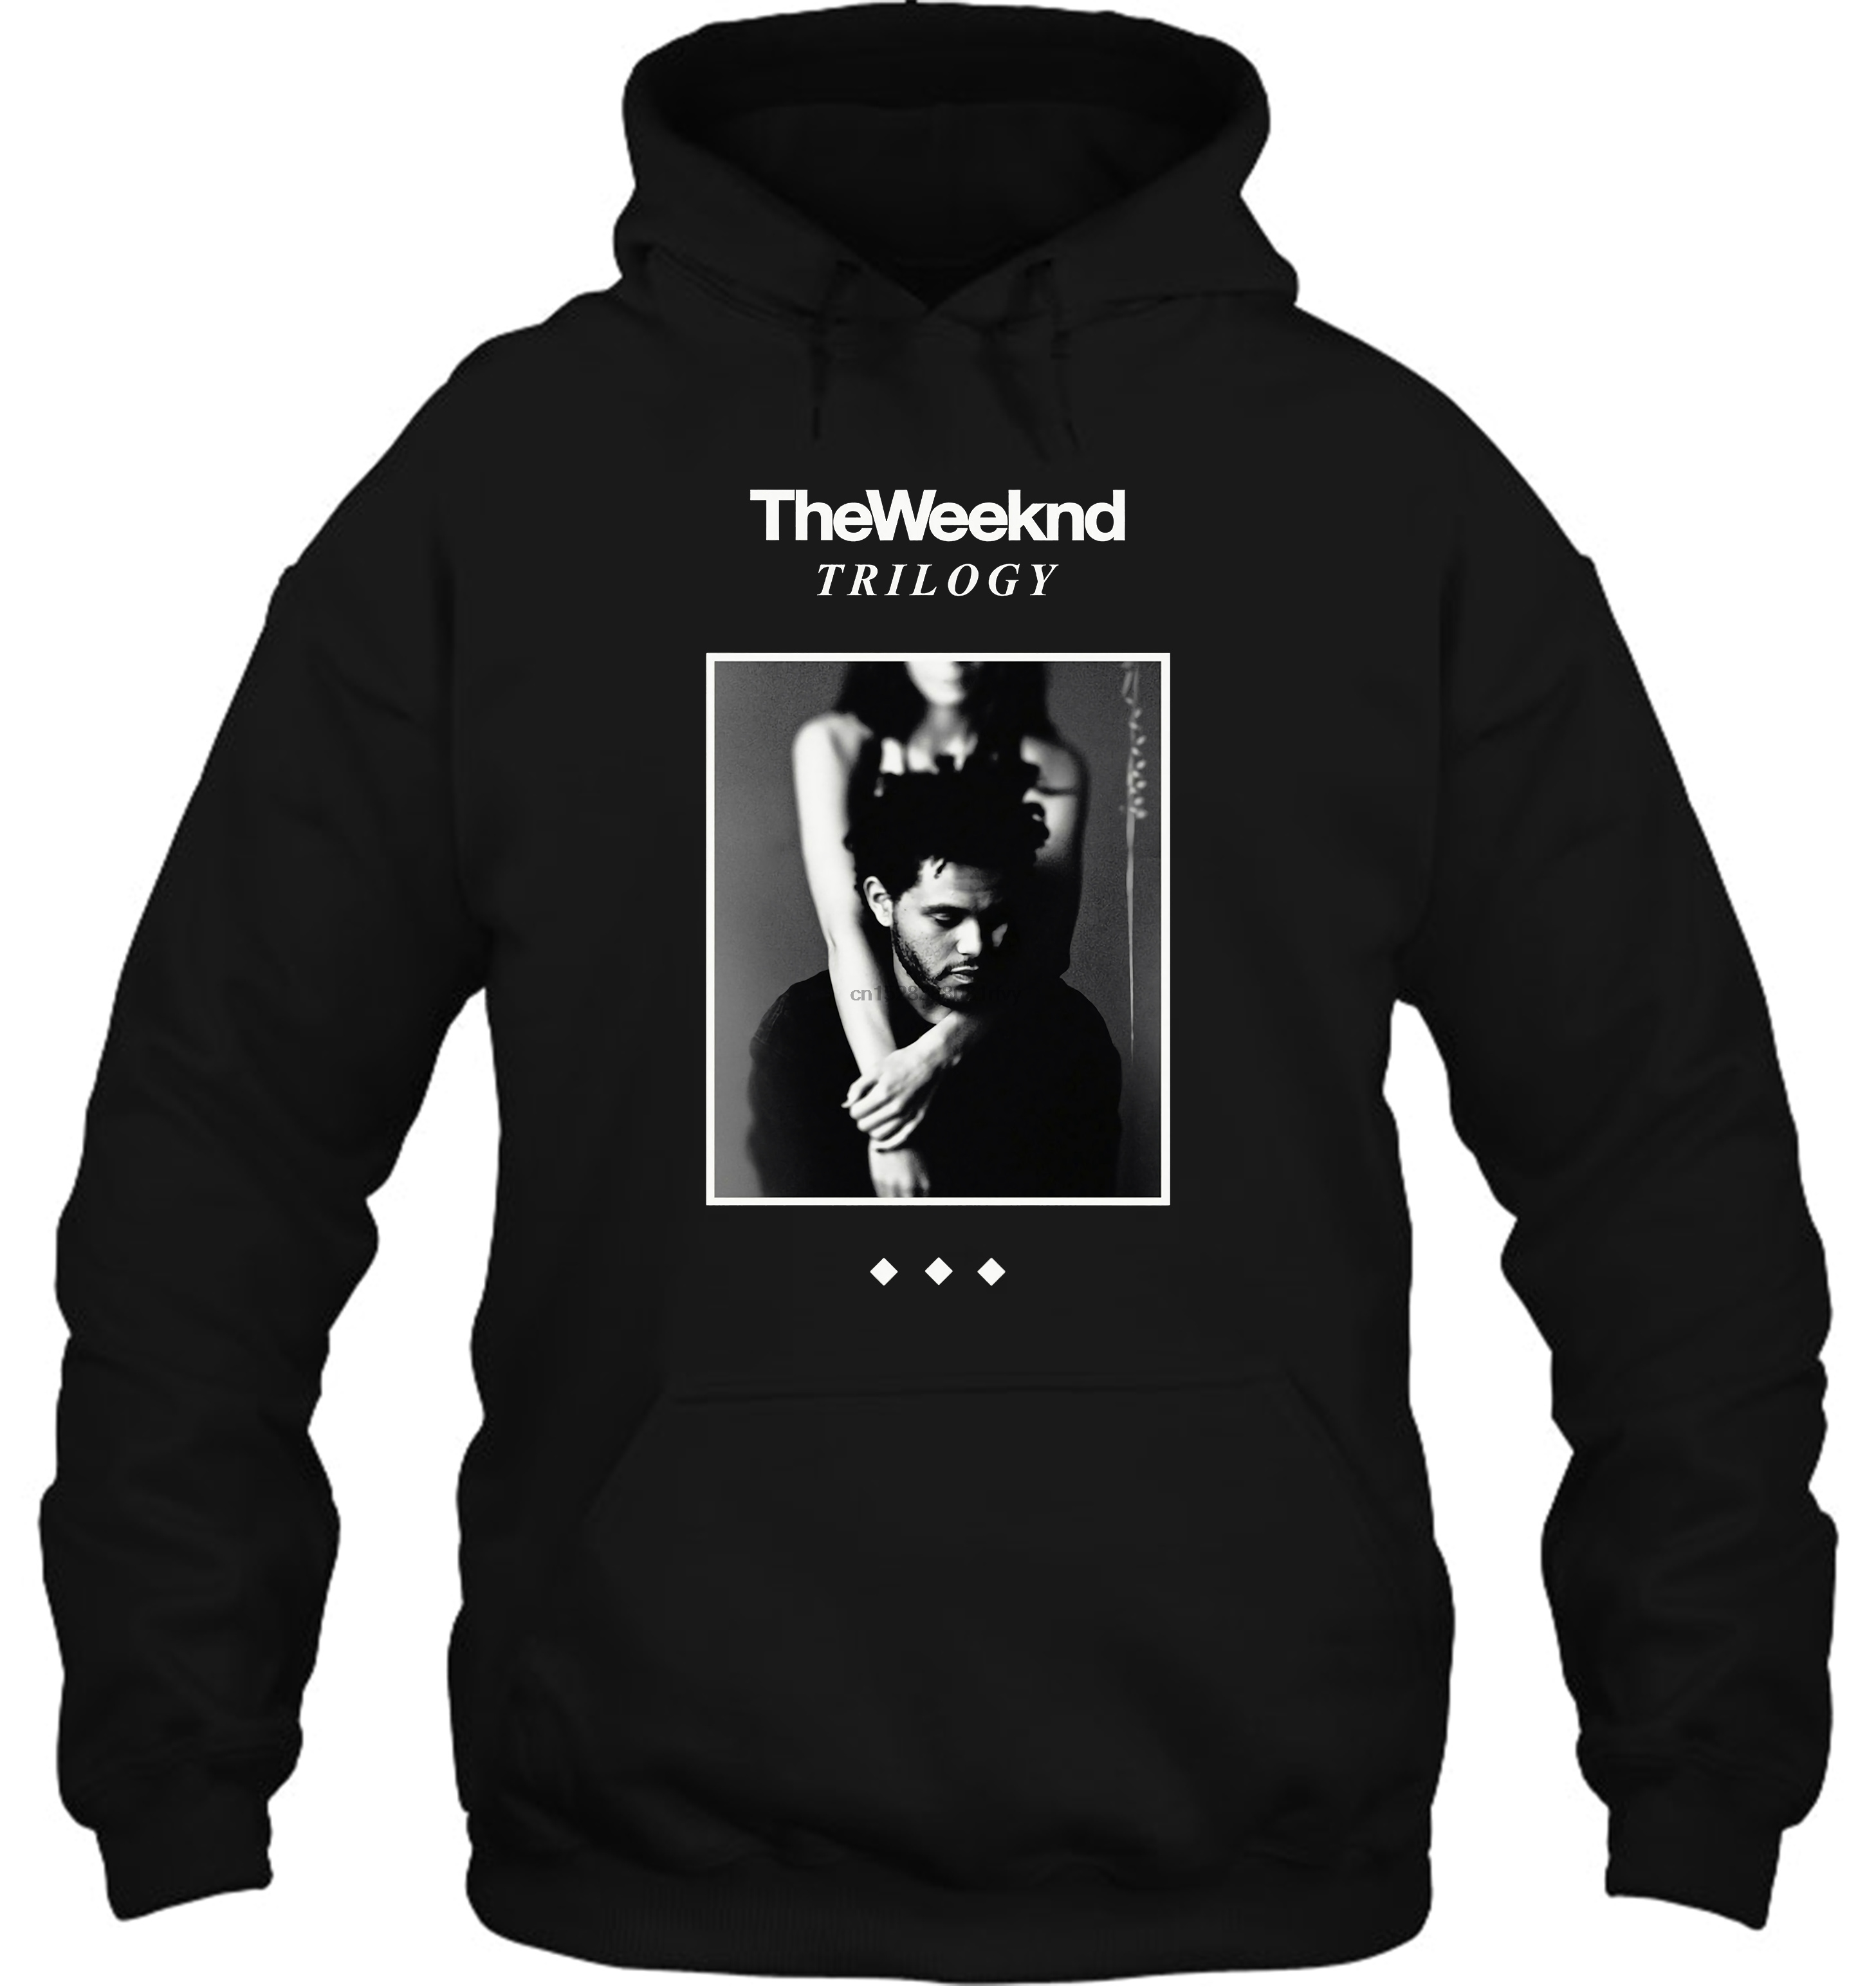 The Weeknd Trilogy Album Cover XO Black White Shirt Fashion Streetwear Men Women Hoodies Sweatshirts